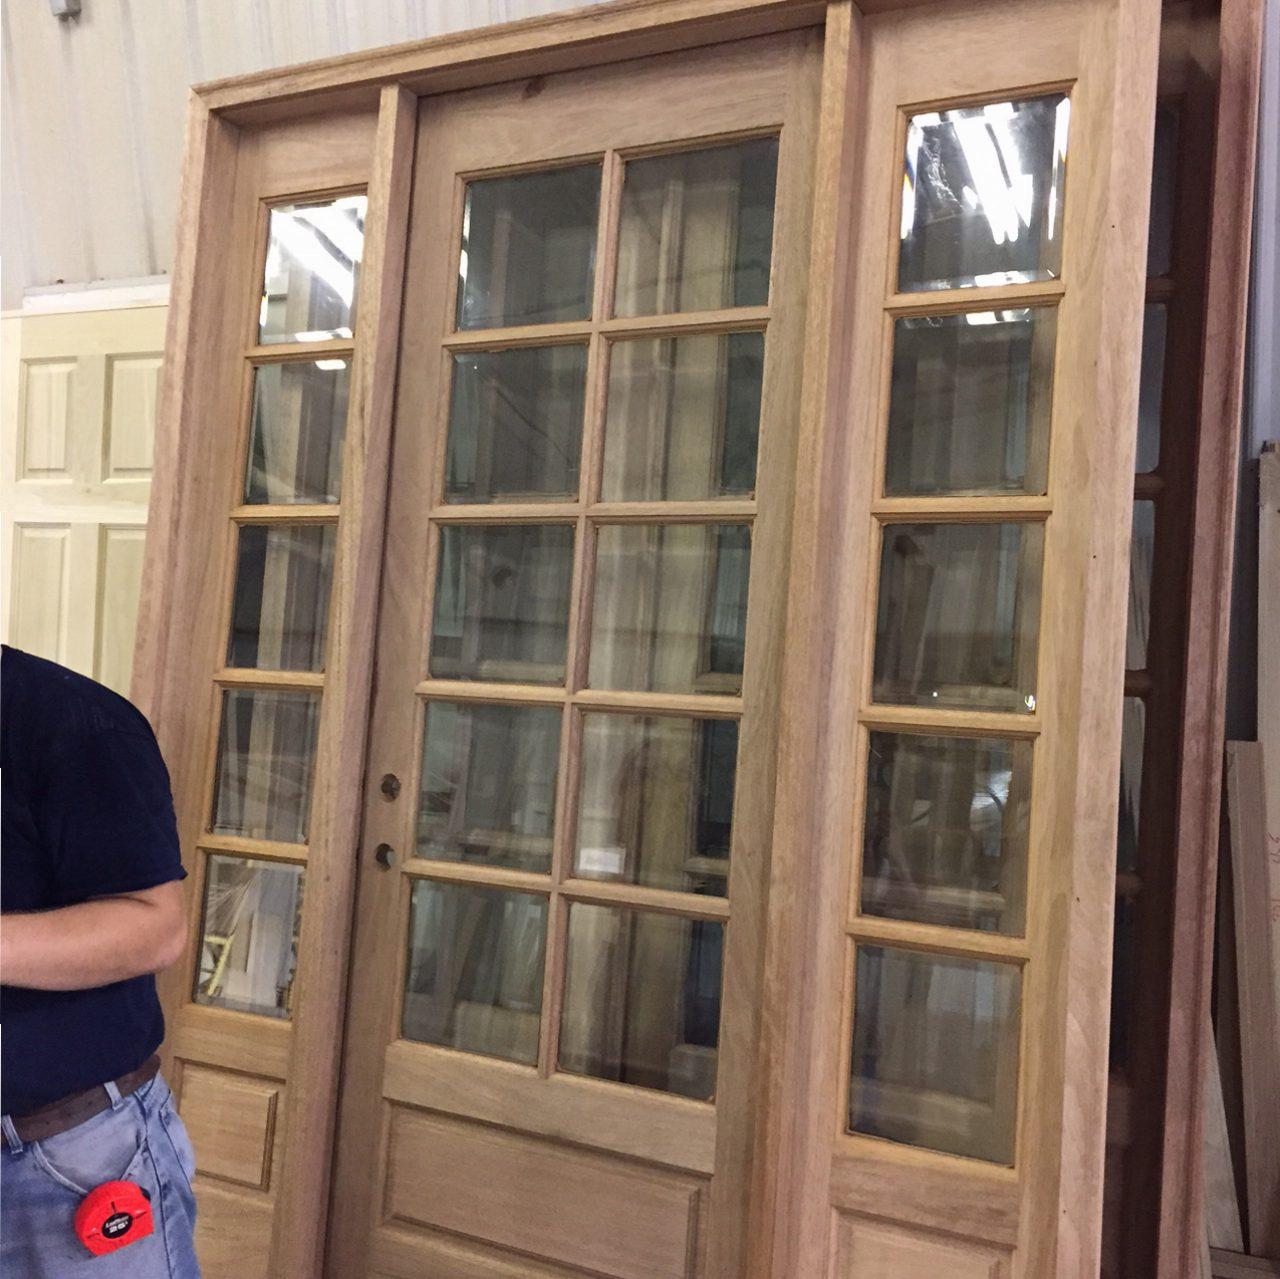 COM ( AMISH CUSTOM DOORS ) PICTURES OF DOOR BEING PREHUNG ! SOLID MAHOGANY 8 FT DOOR / 10 LIGHT TRUE DIVIDED WITH BEVELED INSULATED GLASS DOOR 36 x 96 with ... & Shop Pictures - Amish Custom Doors